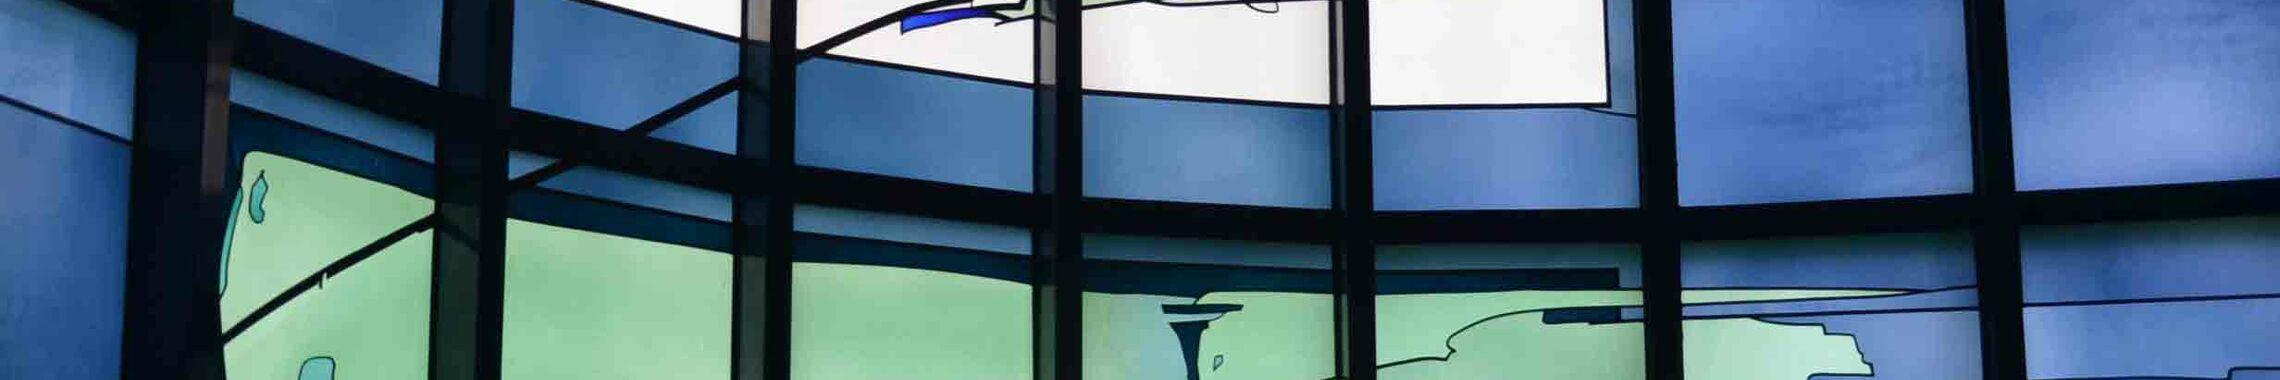 glasfenster_blau_kopf